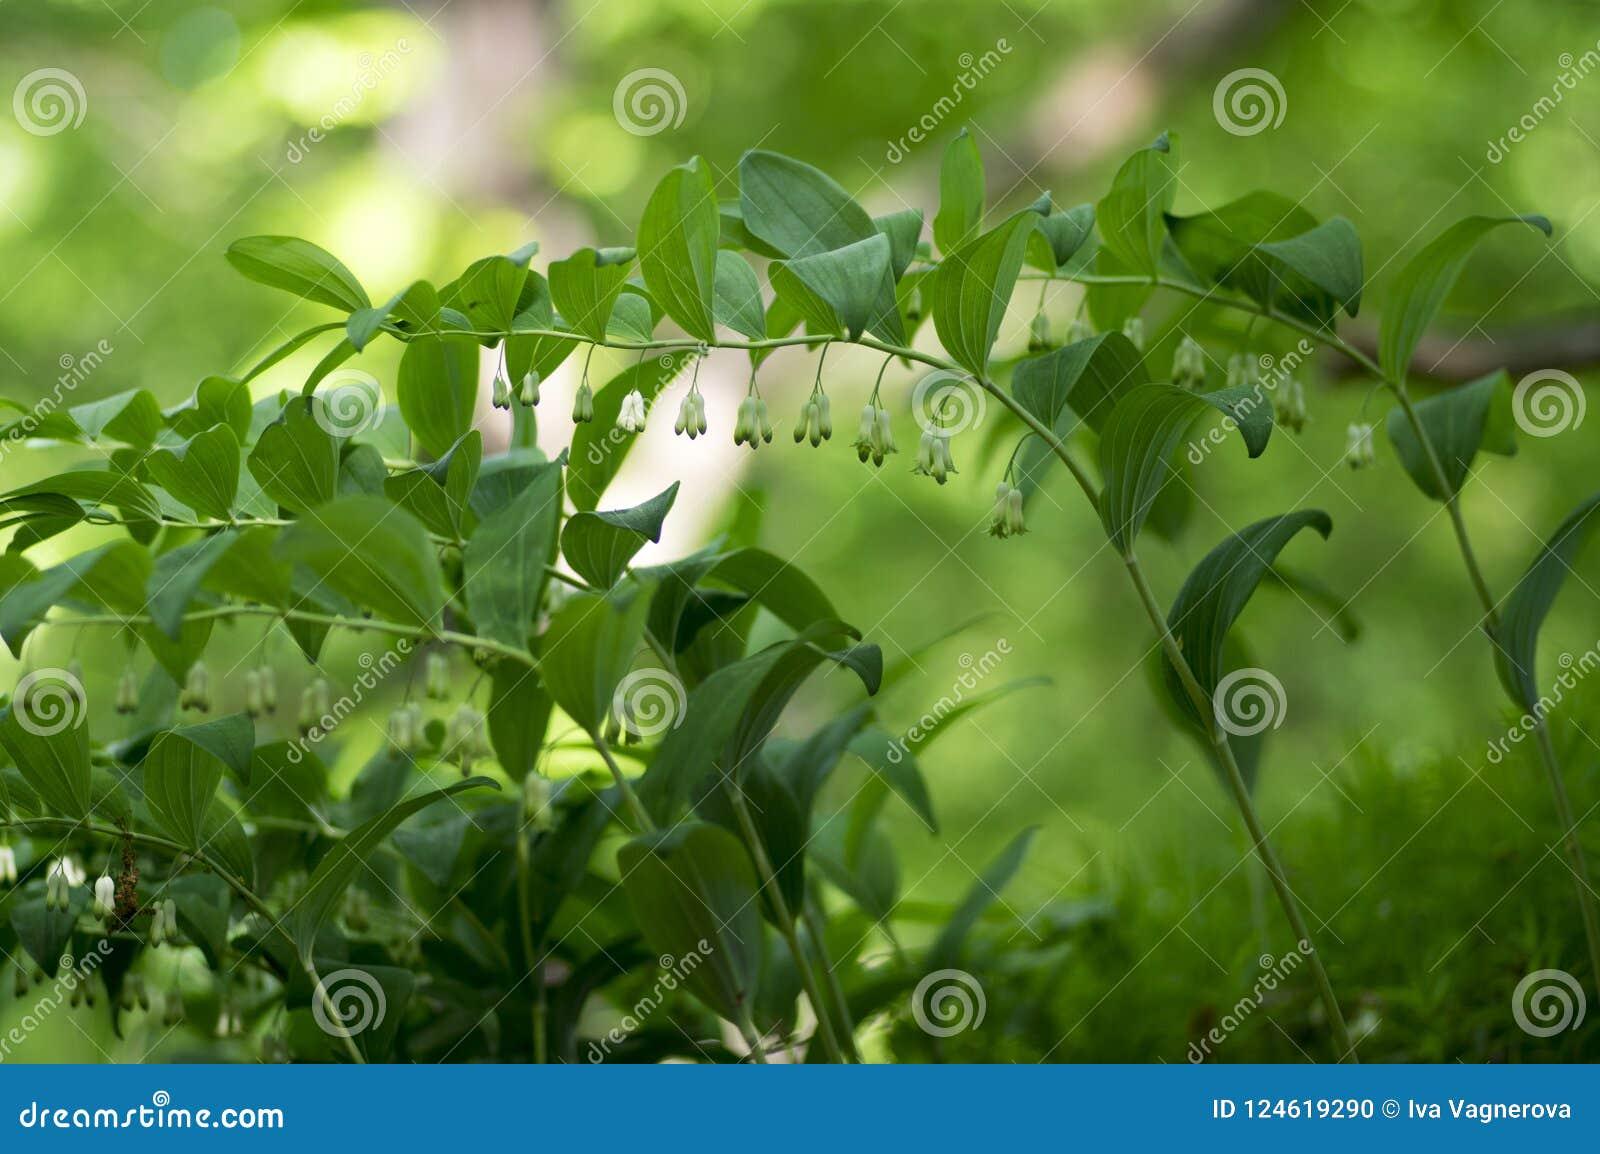 Polygonatum Odoratum White Forest Flowers In Bloom